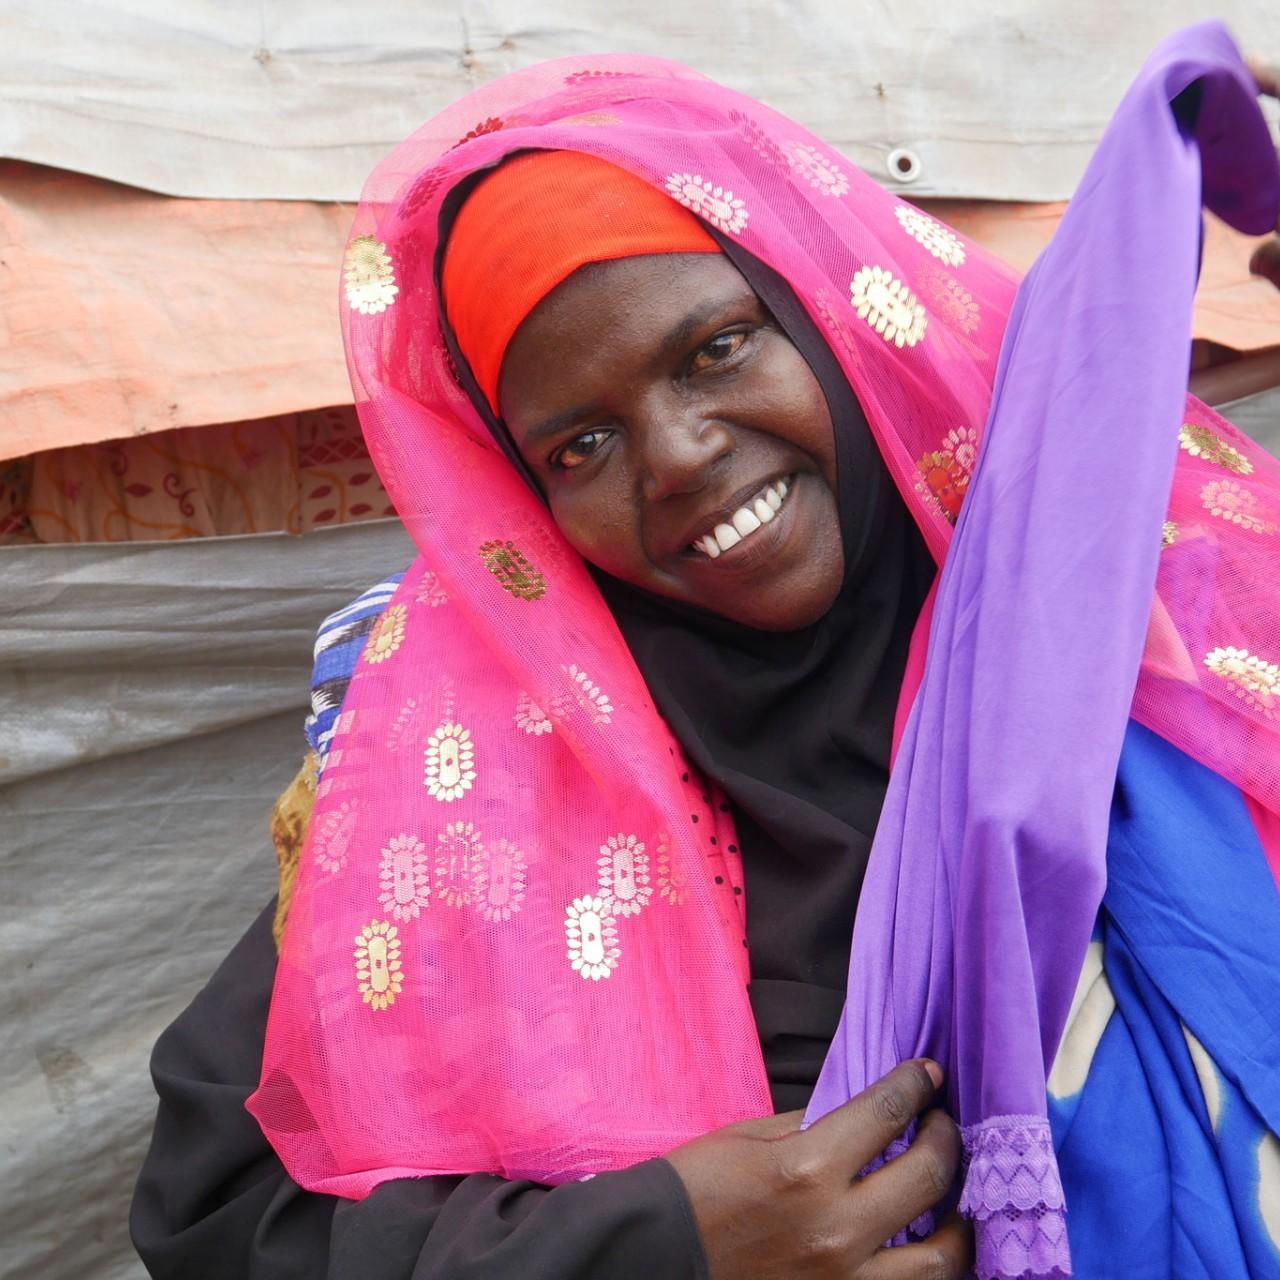 Somalia: Women entrepreneurs carve out a living in Mogadishu